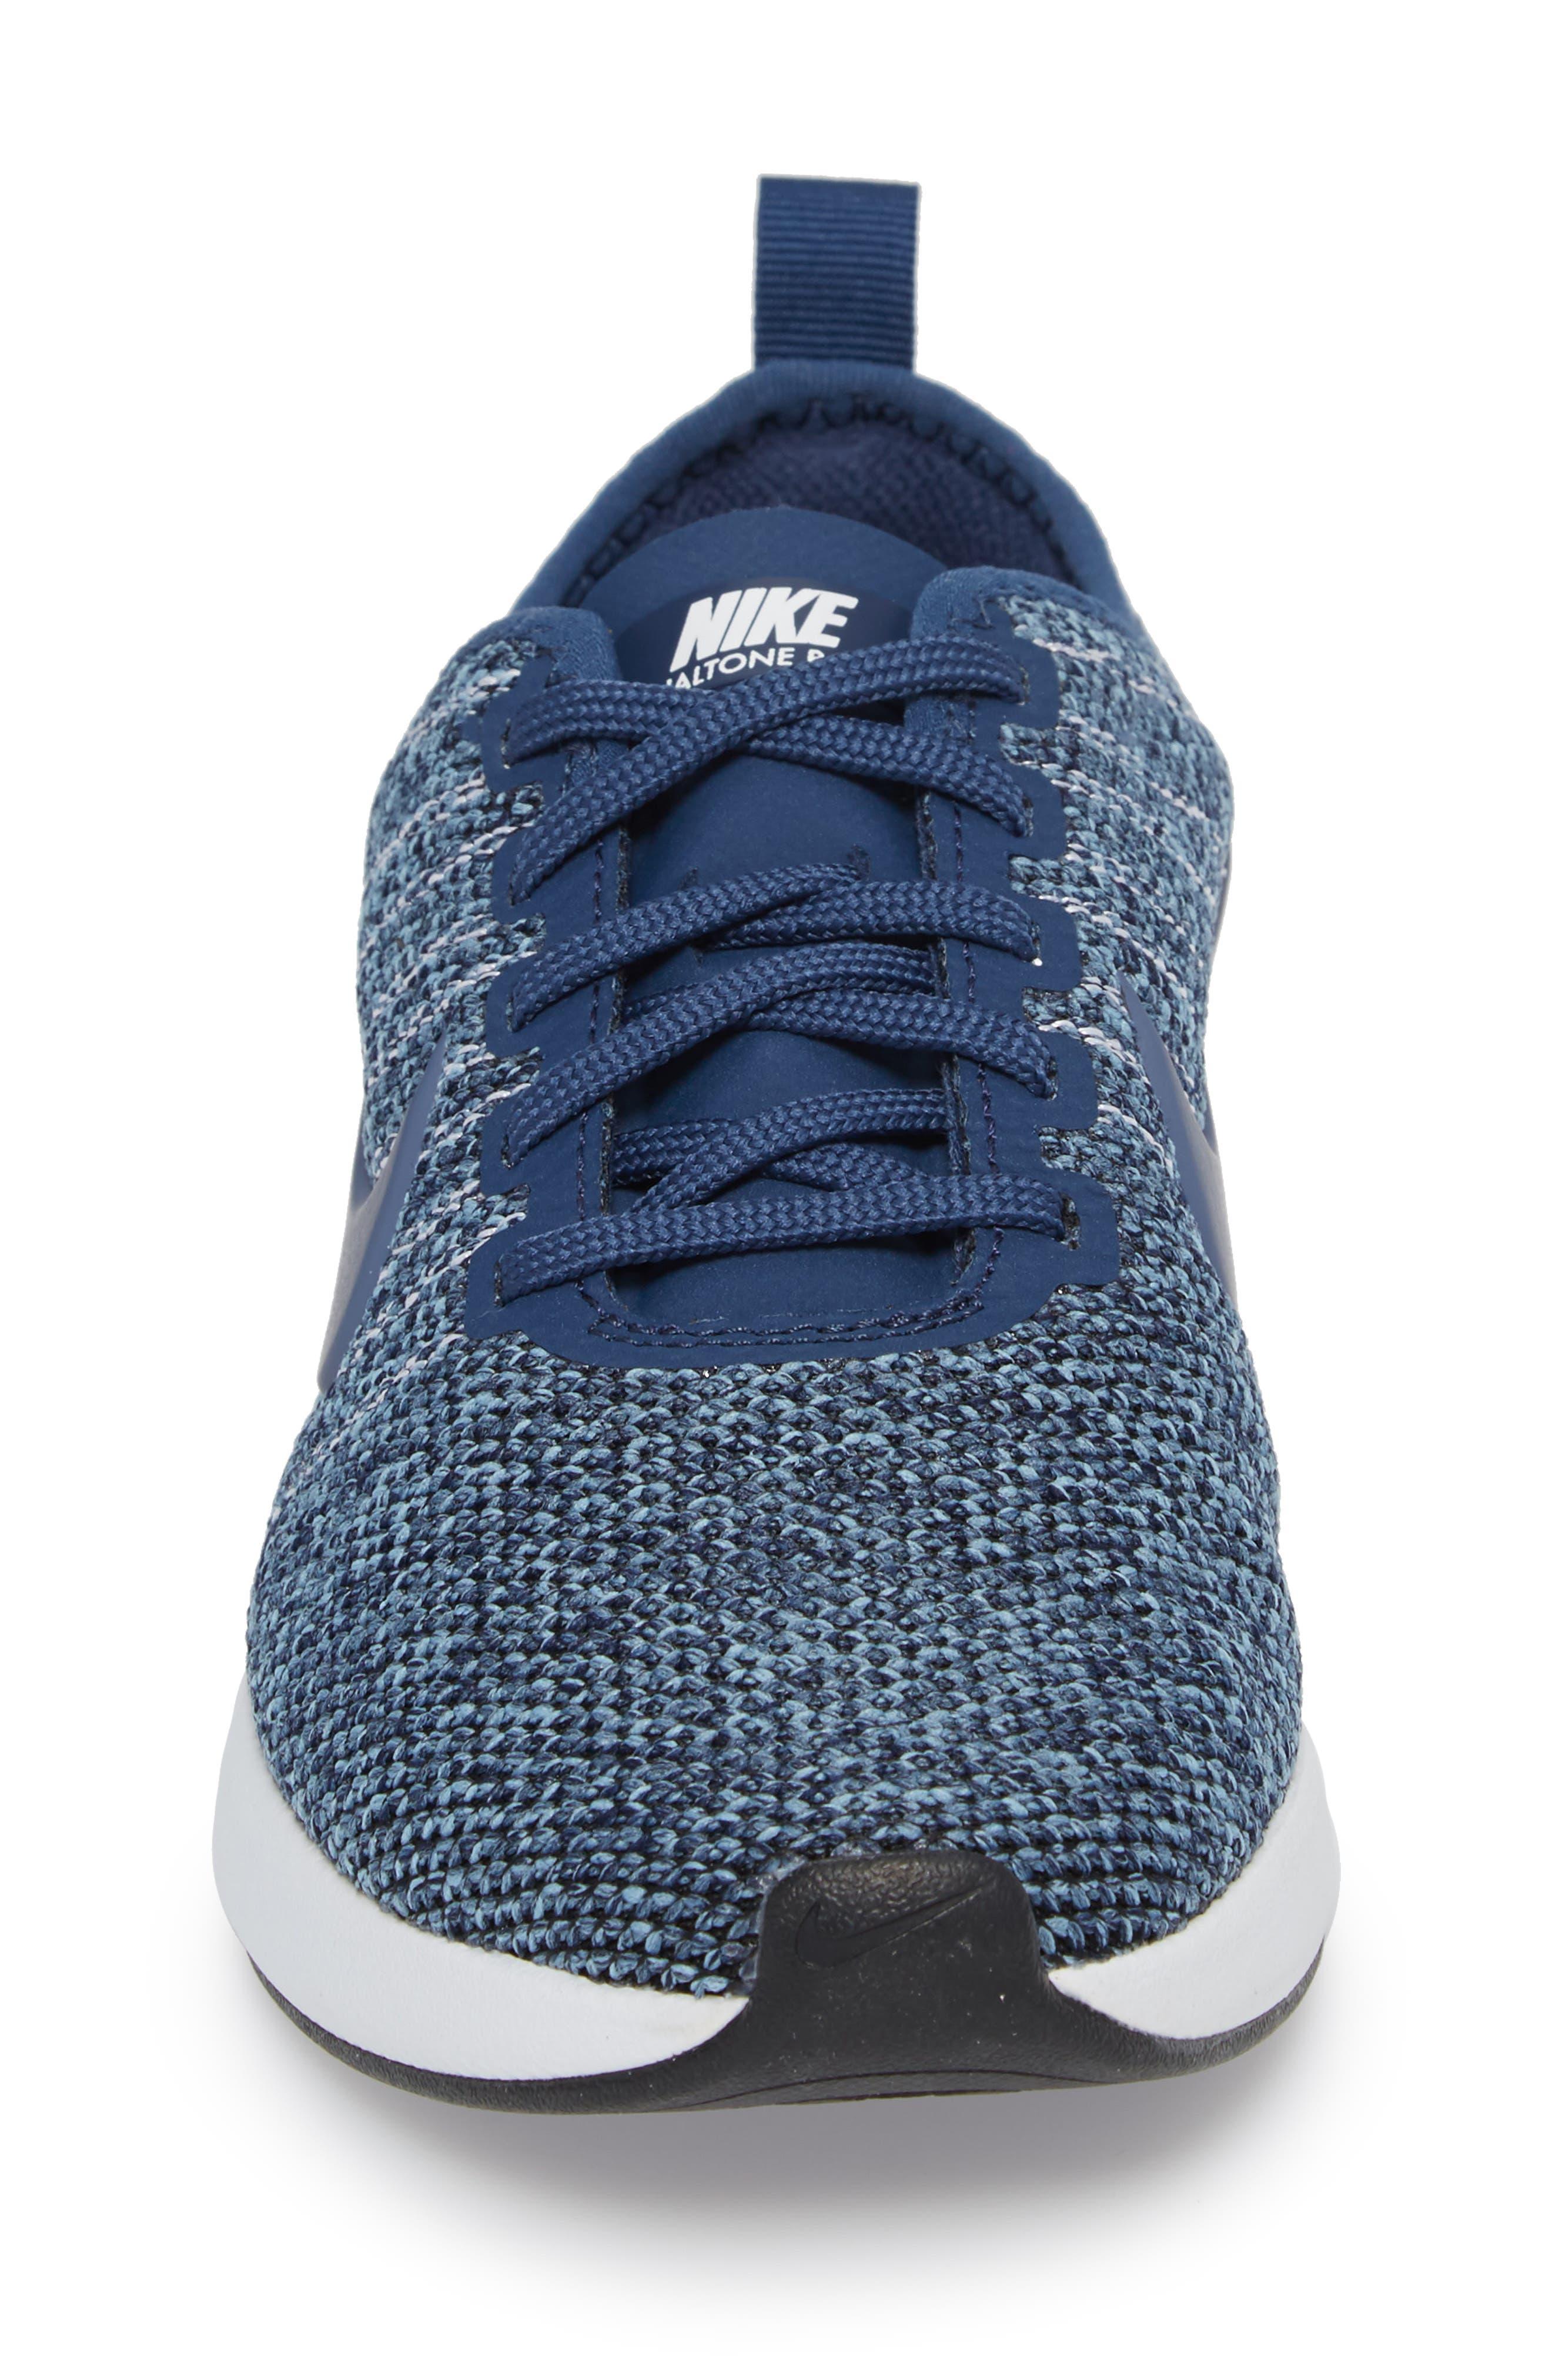 Dualtone Racer PRM Sneaker,                             Alternate thumbnail 4, color,                             Navy/ Diffused Blue